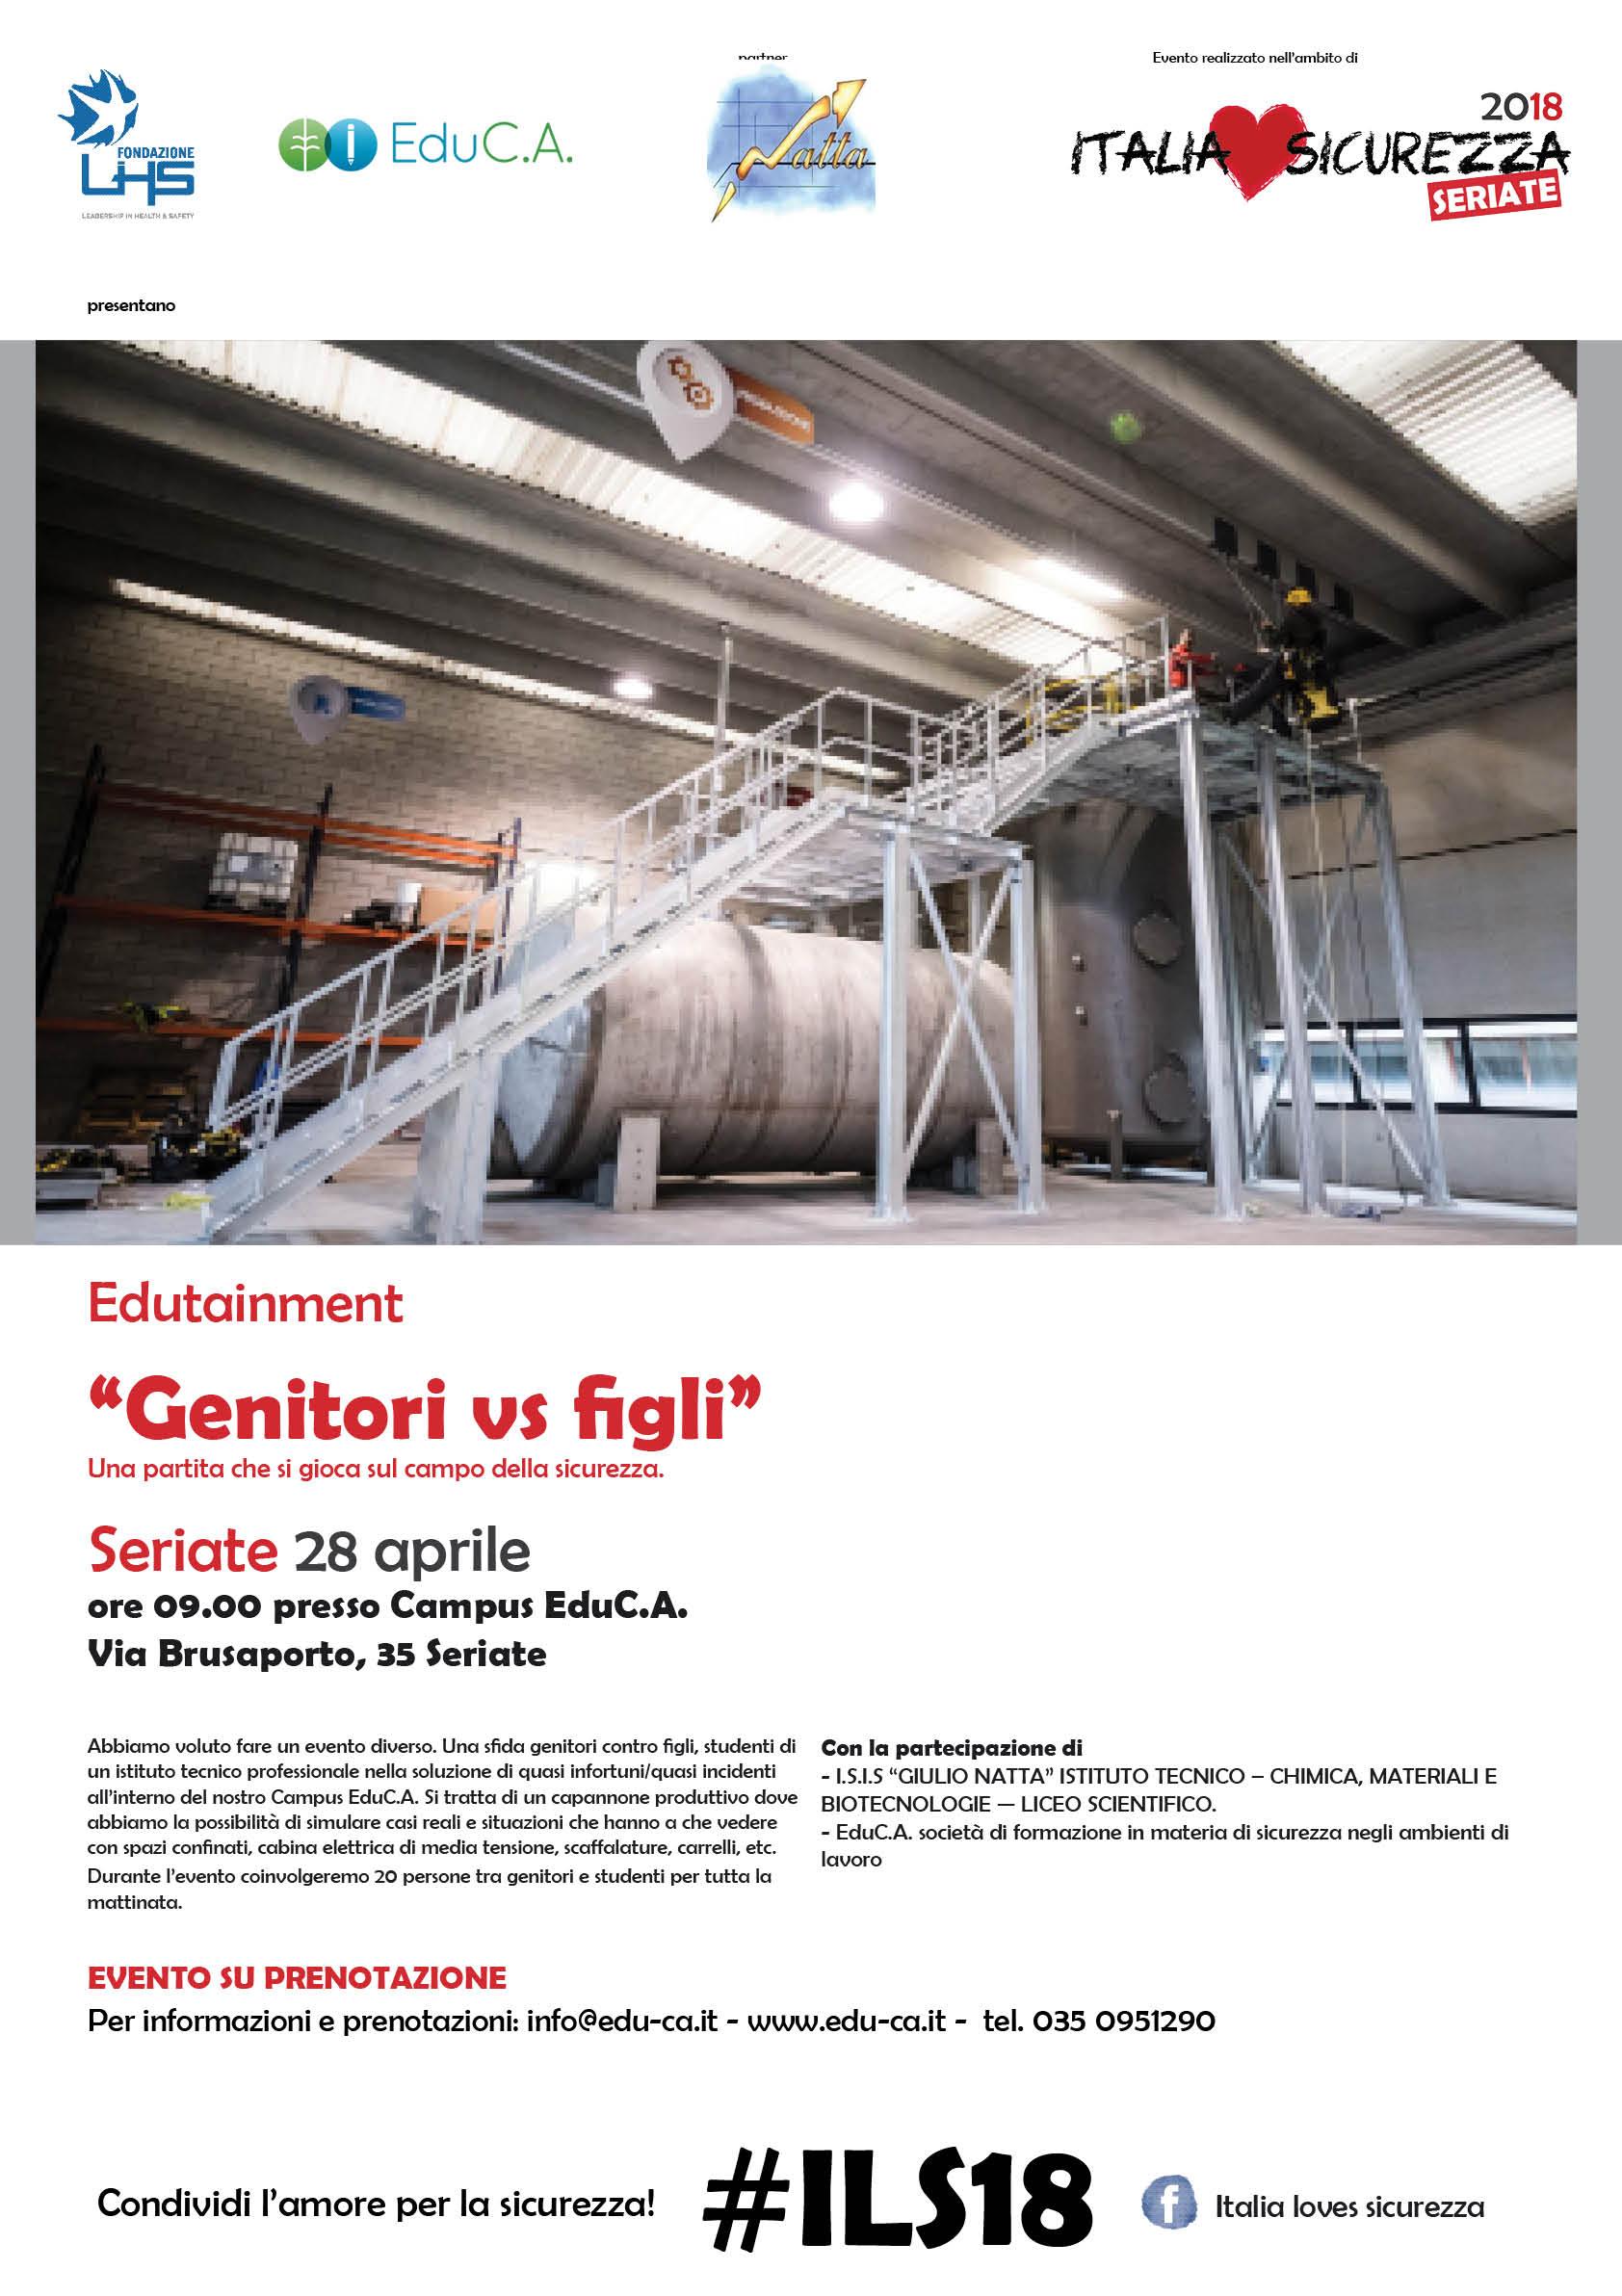 https://www.fondlhs.org/wp-content/uploads/2018/04/ILS18_Poster_EDUCA-Giasone-bassa.jpg